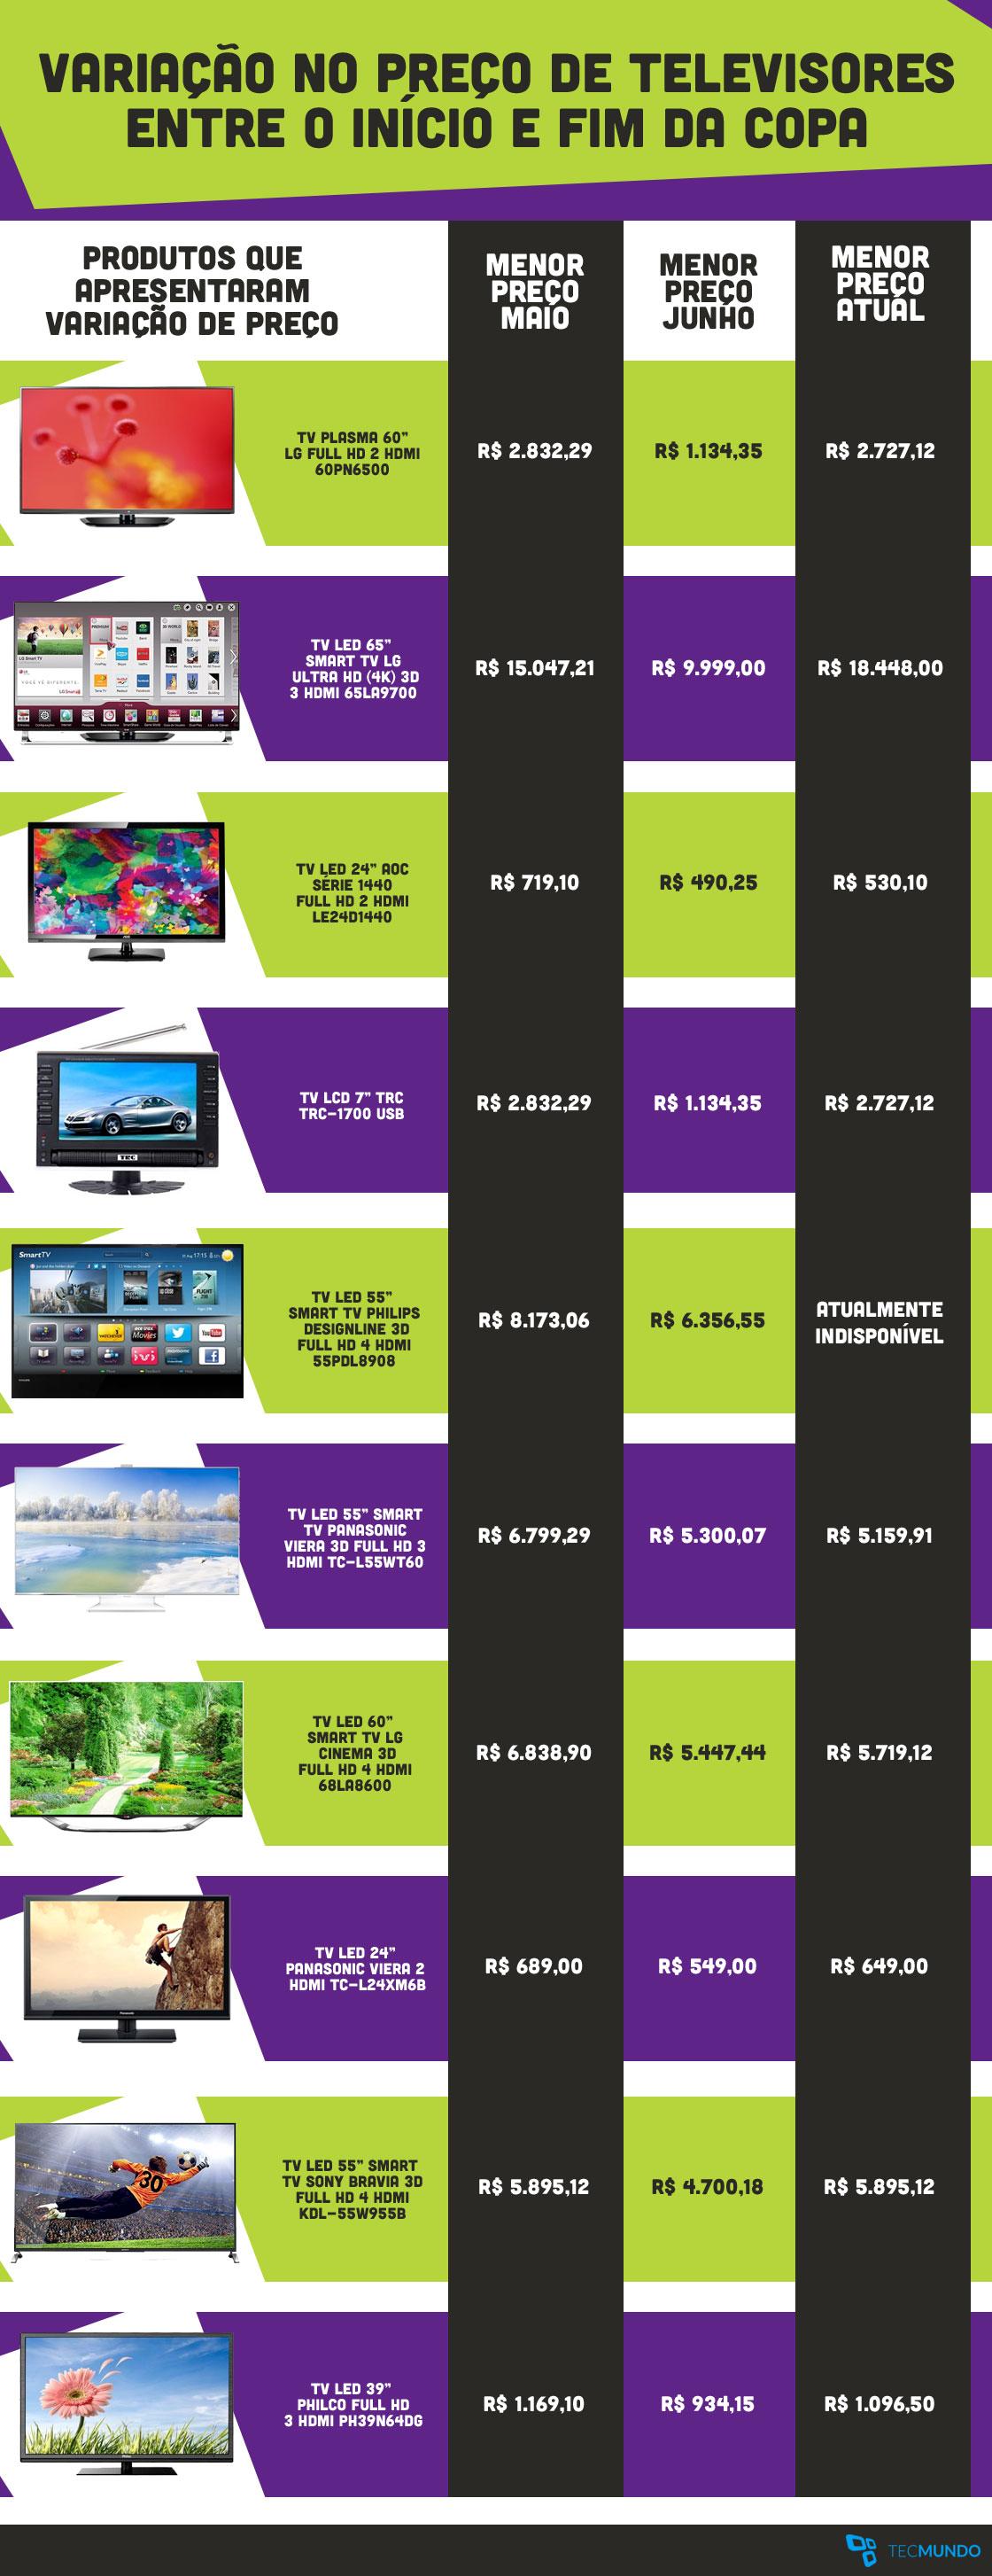 Após derrota do Brasil na Copa, preço de TVs sobe nas lojas